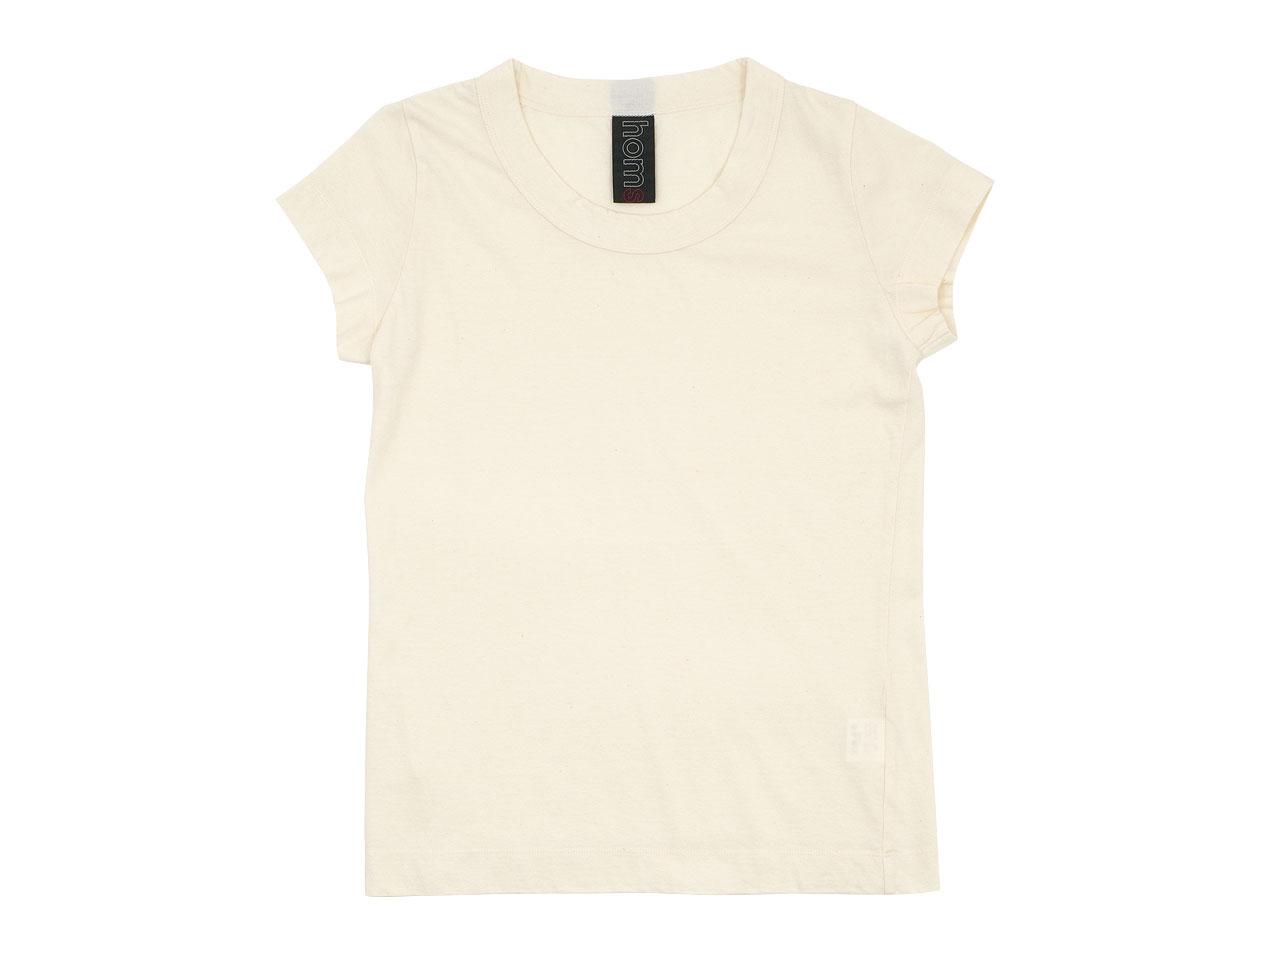 homspun 30/1天竺 フレンチスリーブTシャツ